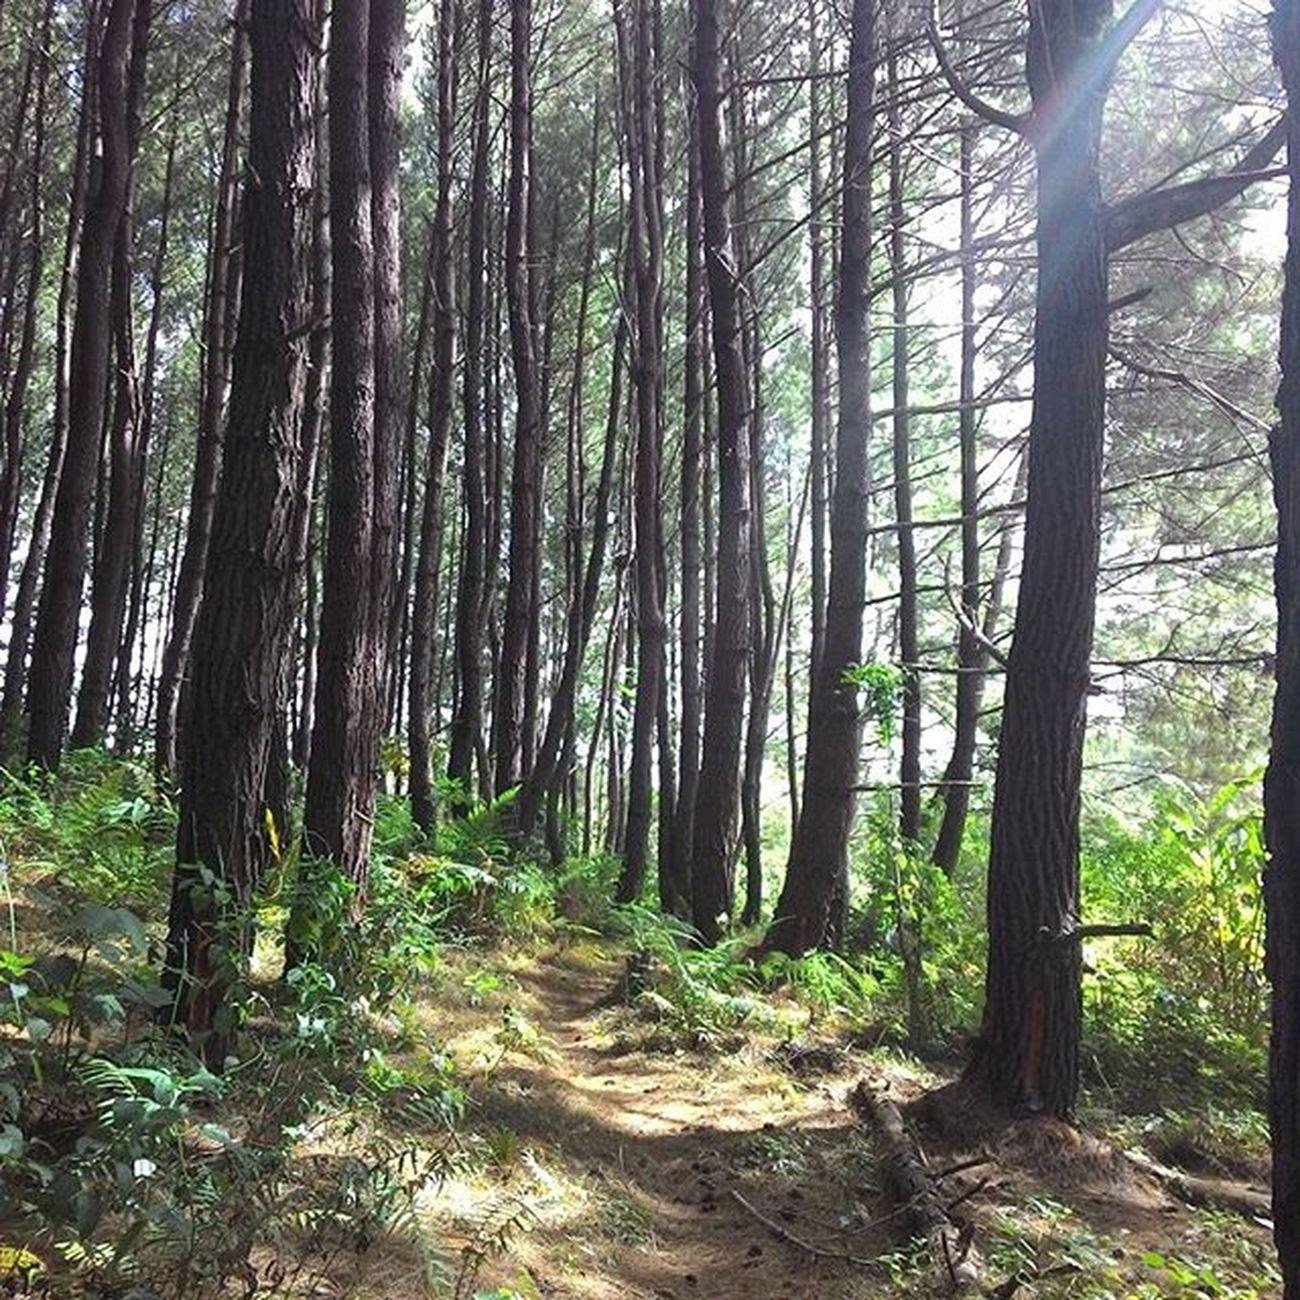 Upload bersama -------------------------------------------- Keluarlah dari rumahmu... diluar sana sangatlah berbeda dengan apa yang engkau pikirkan..... -------------------------------------------- Loc : Hutan Pinus,Desa Salodik,Kecamatan Luwuk -------------------------------------------- @instanusantara Instanusantara Inub9719 InstanusantaraPalu Palunagaya